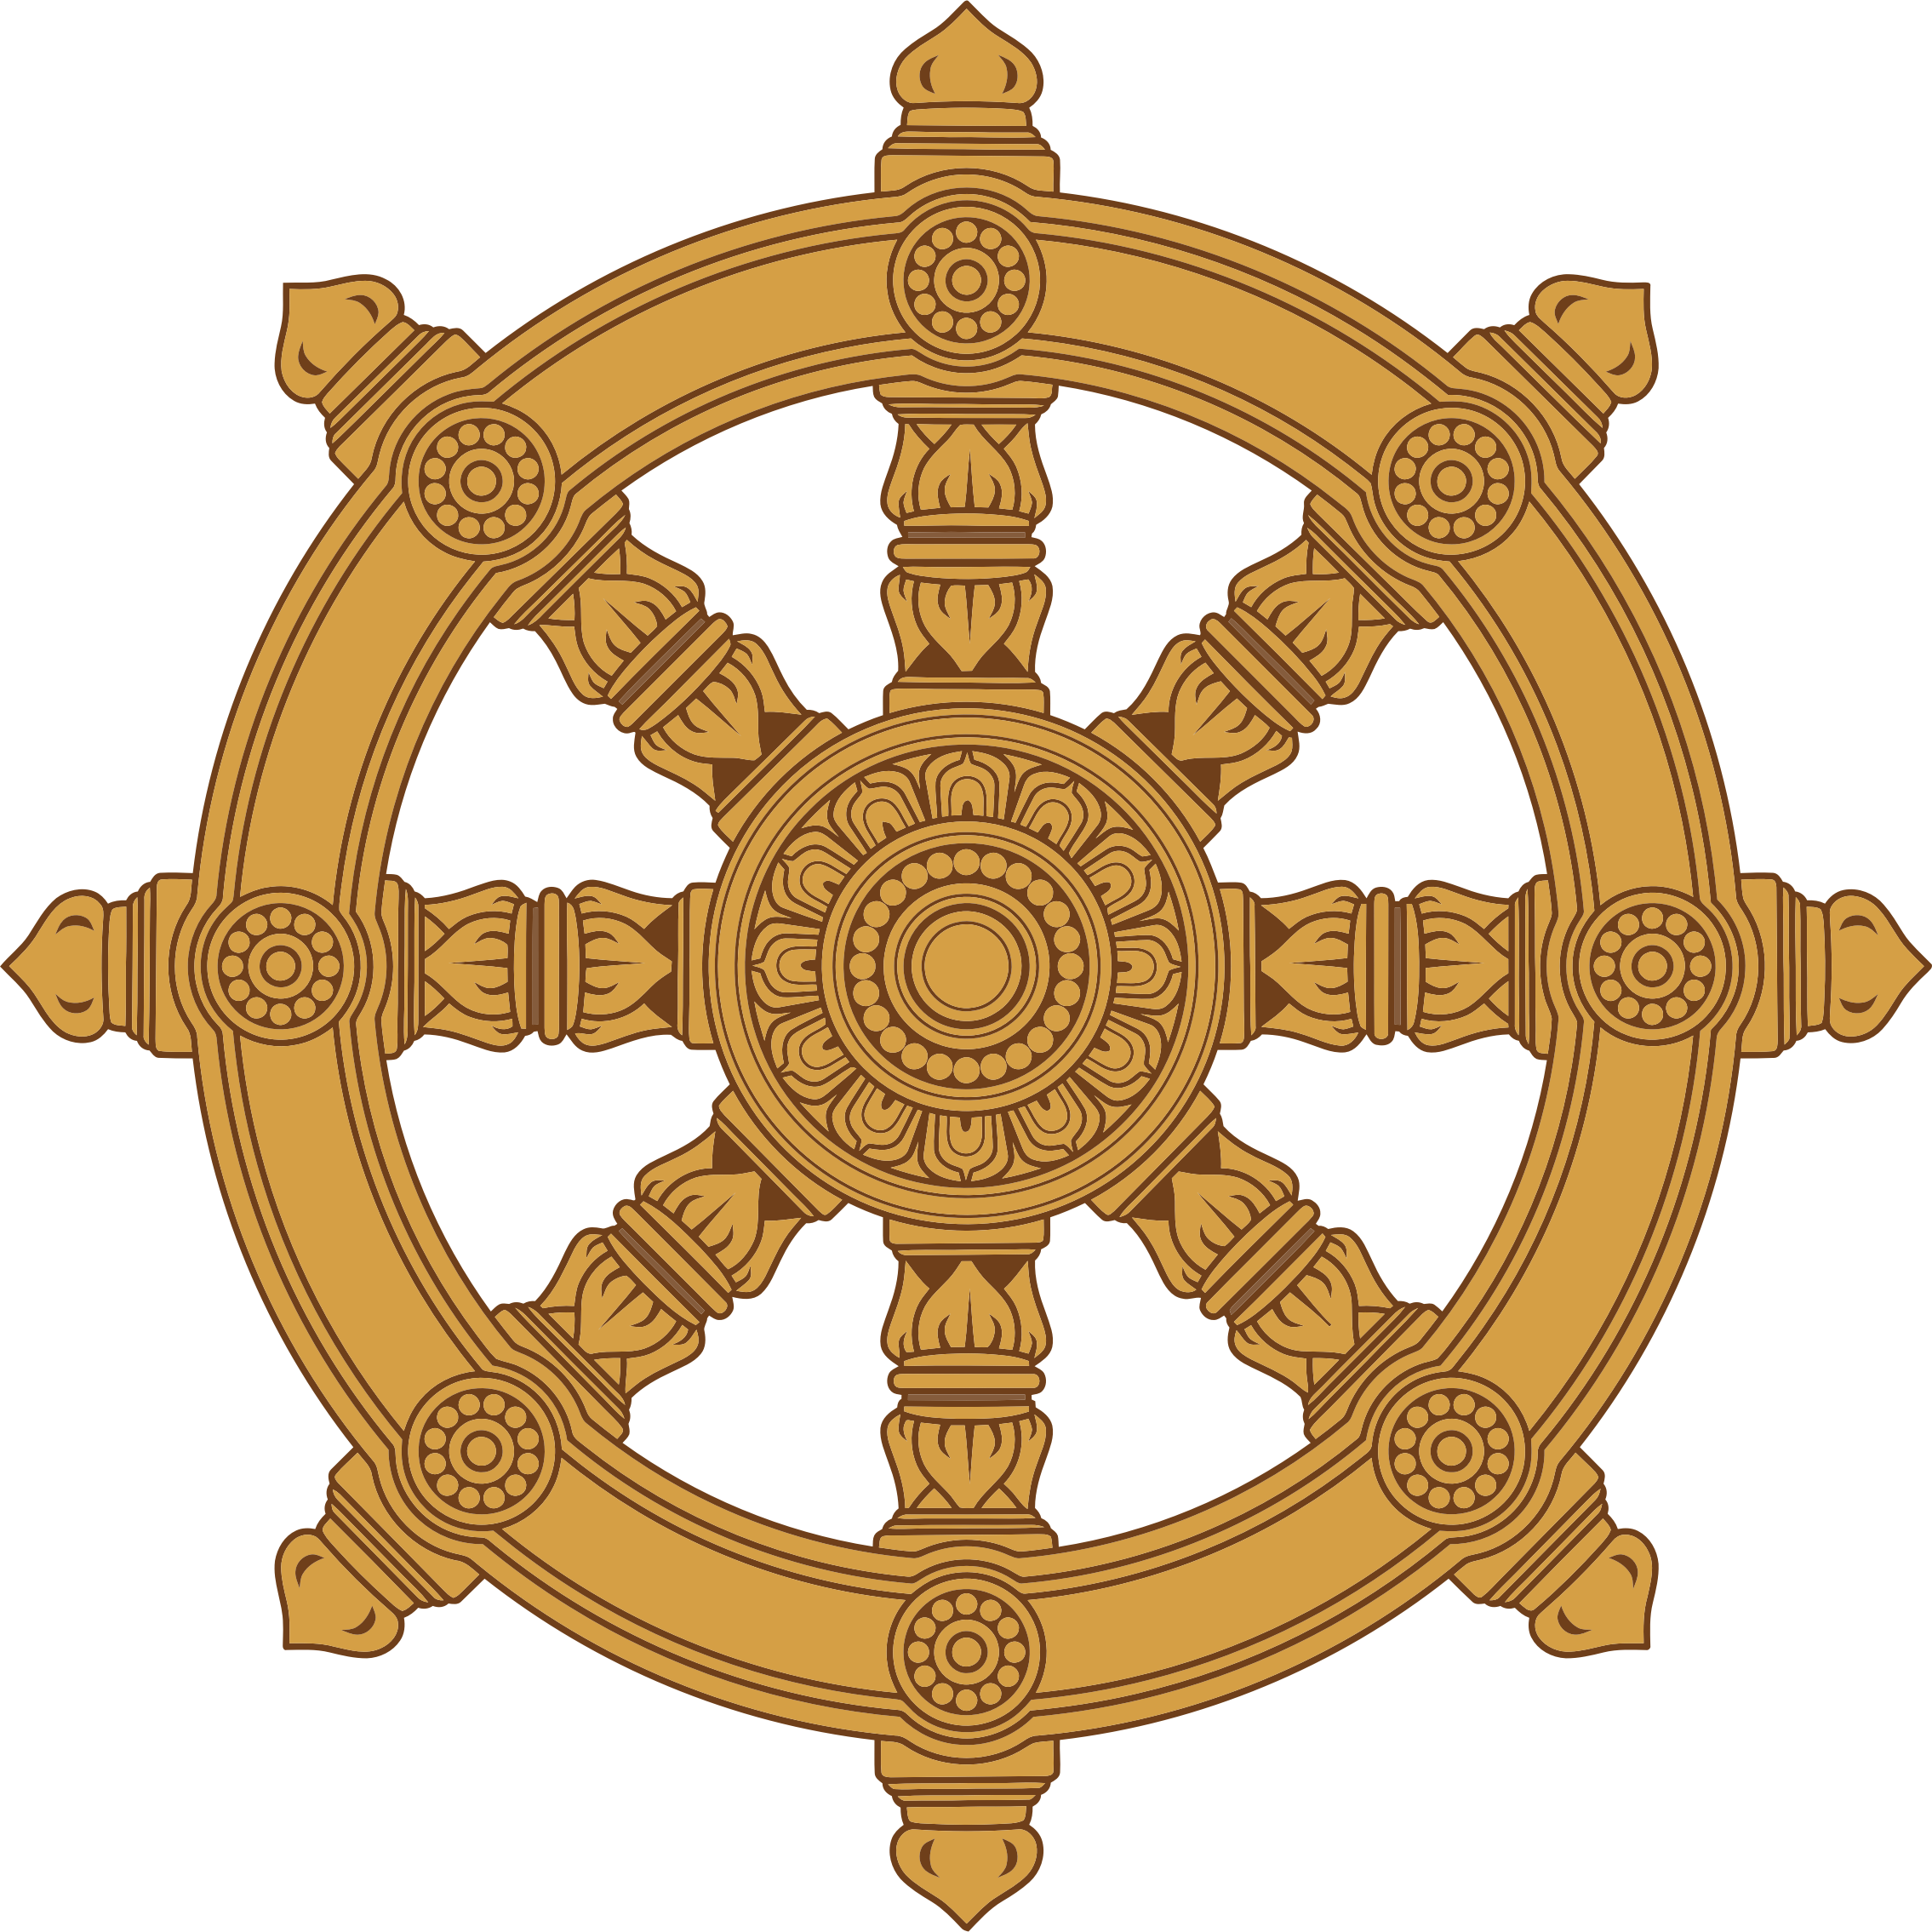 Wheel Clipart Buddhist #6-Wheel clipart buddhist #6-16